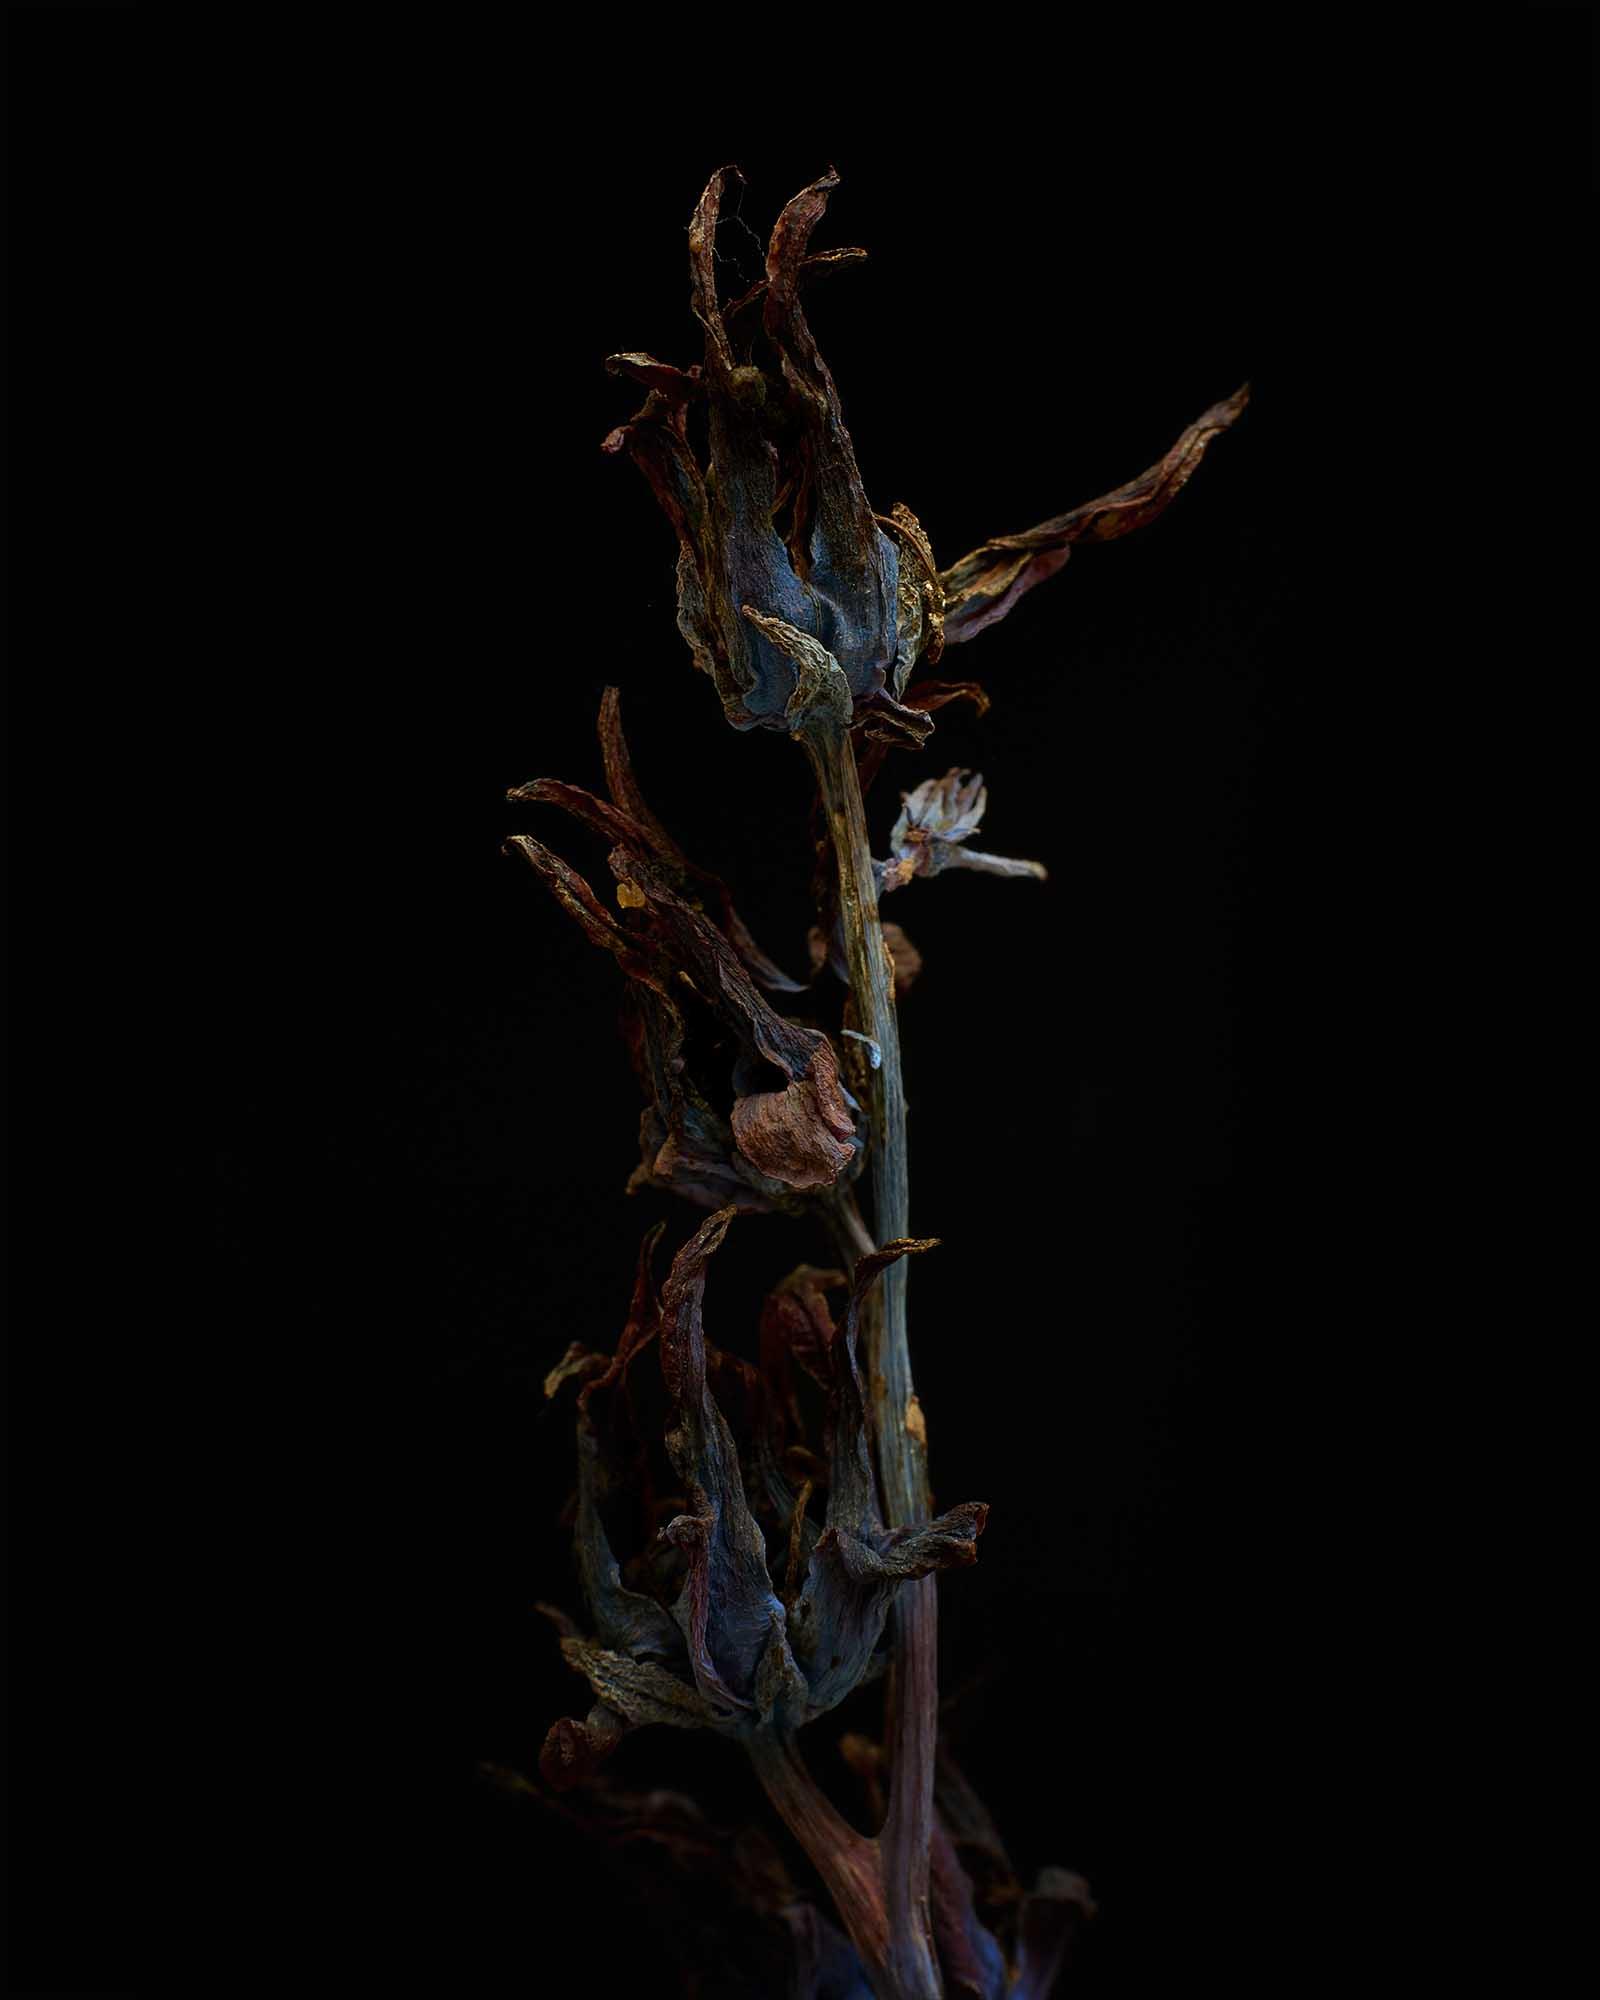 dried1.jpg